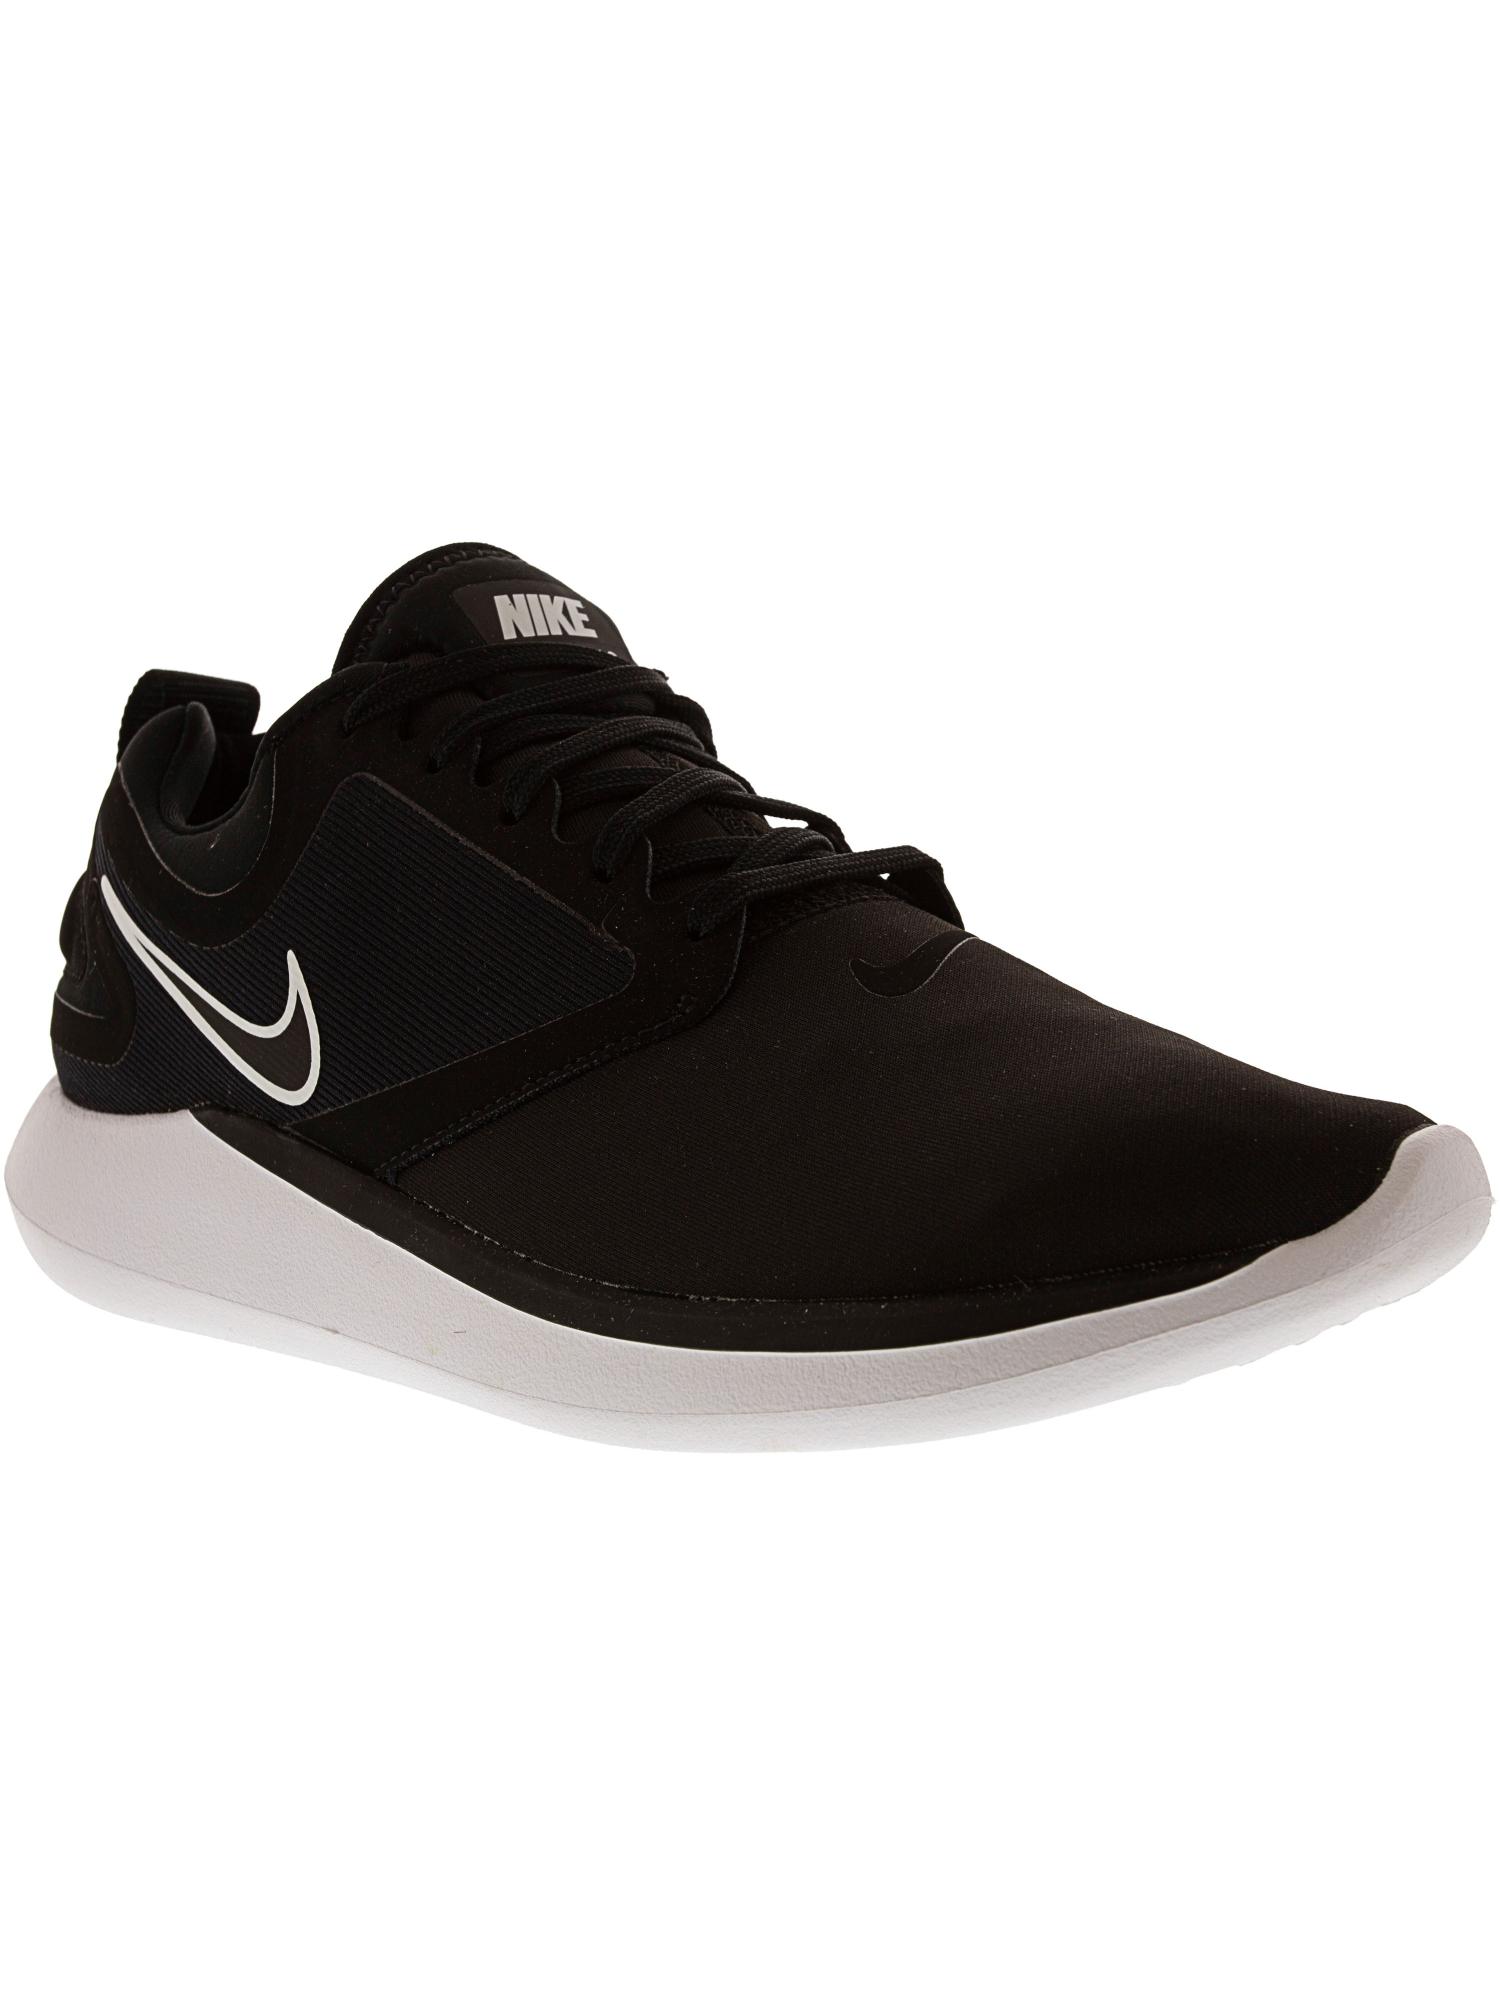 info for 630ec 99cc2 Nike-Men-039-s-lunarsolo-Tornozelo-Alta-Tenis-